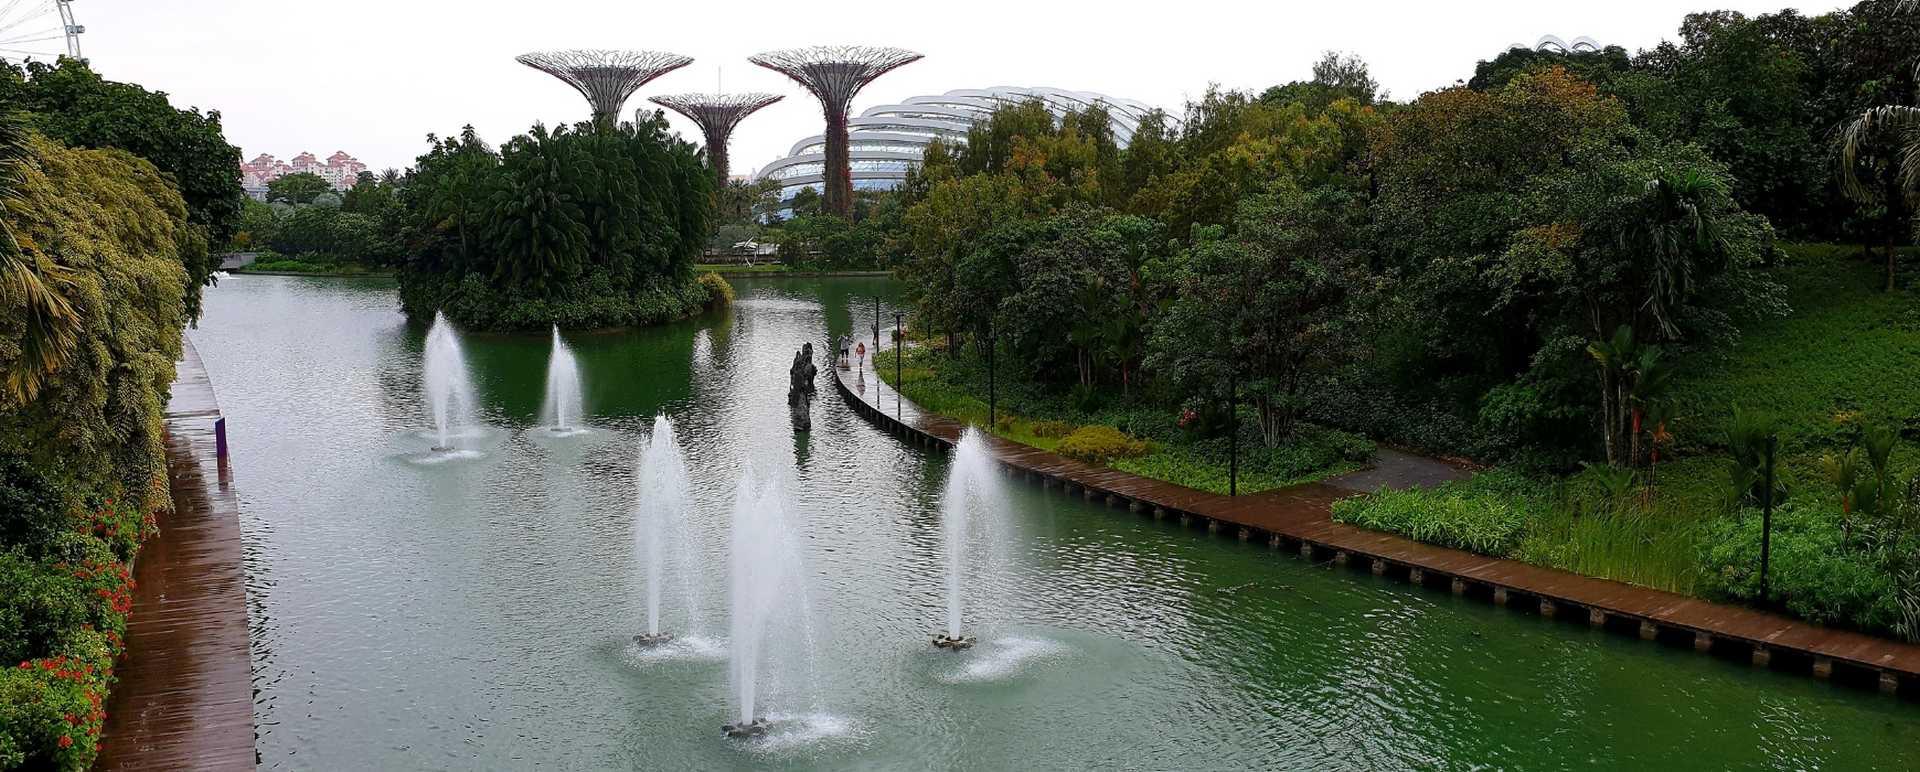 Die Gardens by the Bay in Singapur